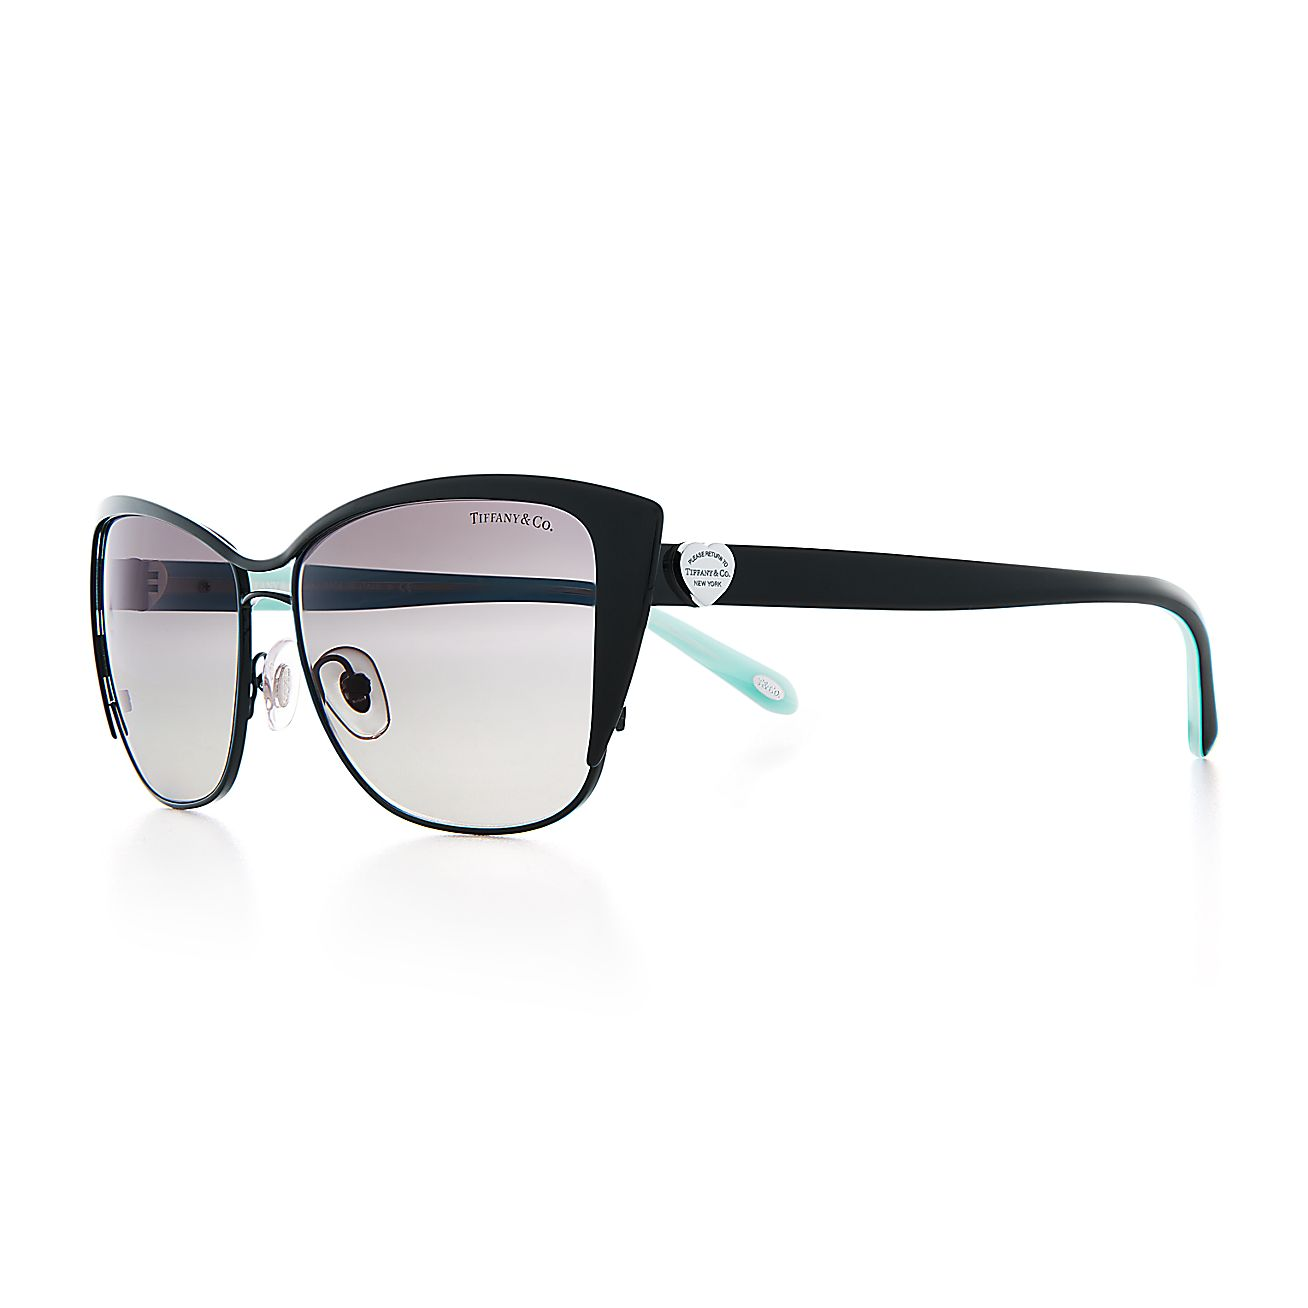 3917372af4e6 Return to Tiffany® cat eye sunglasses in black metal and acetate.